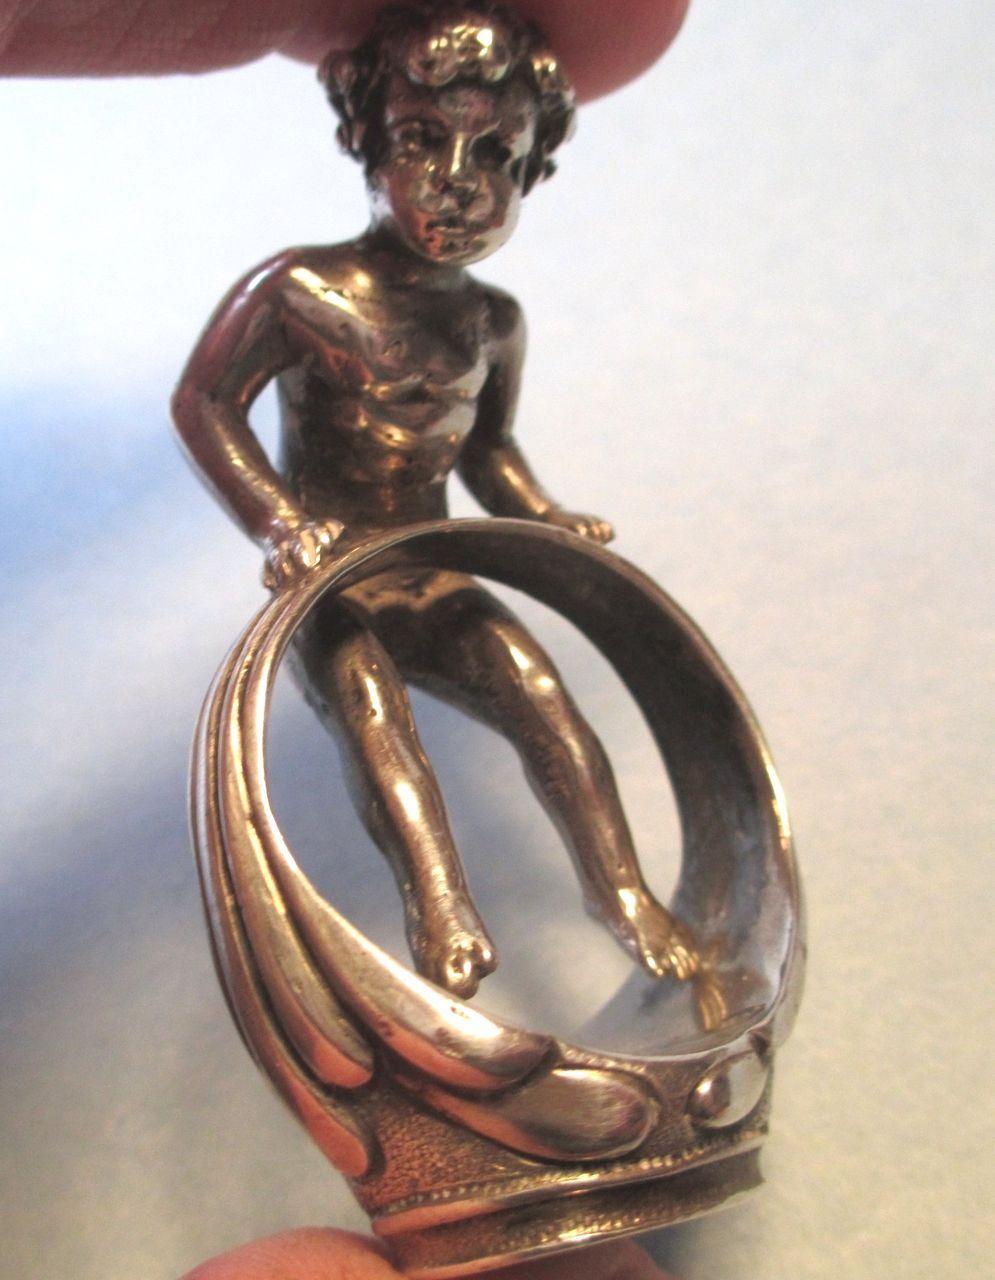 Berthold Muller - Sterling Desk Seal with Cherub in a Finger Ring  - 1907